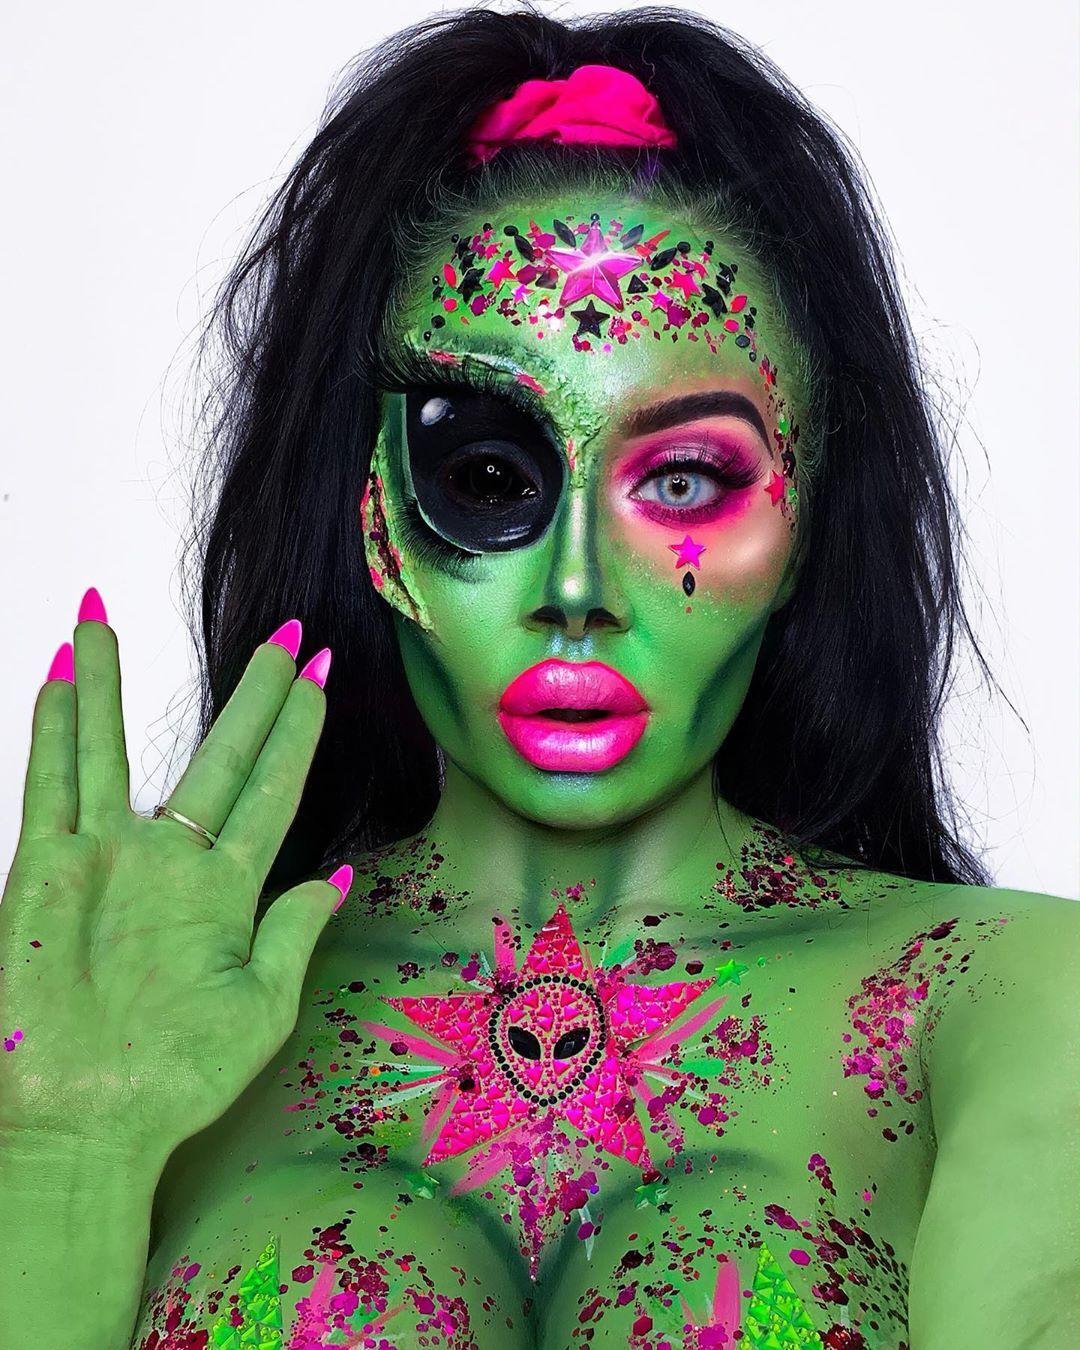 halloween makeup image by SAAS Transportation, Inc